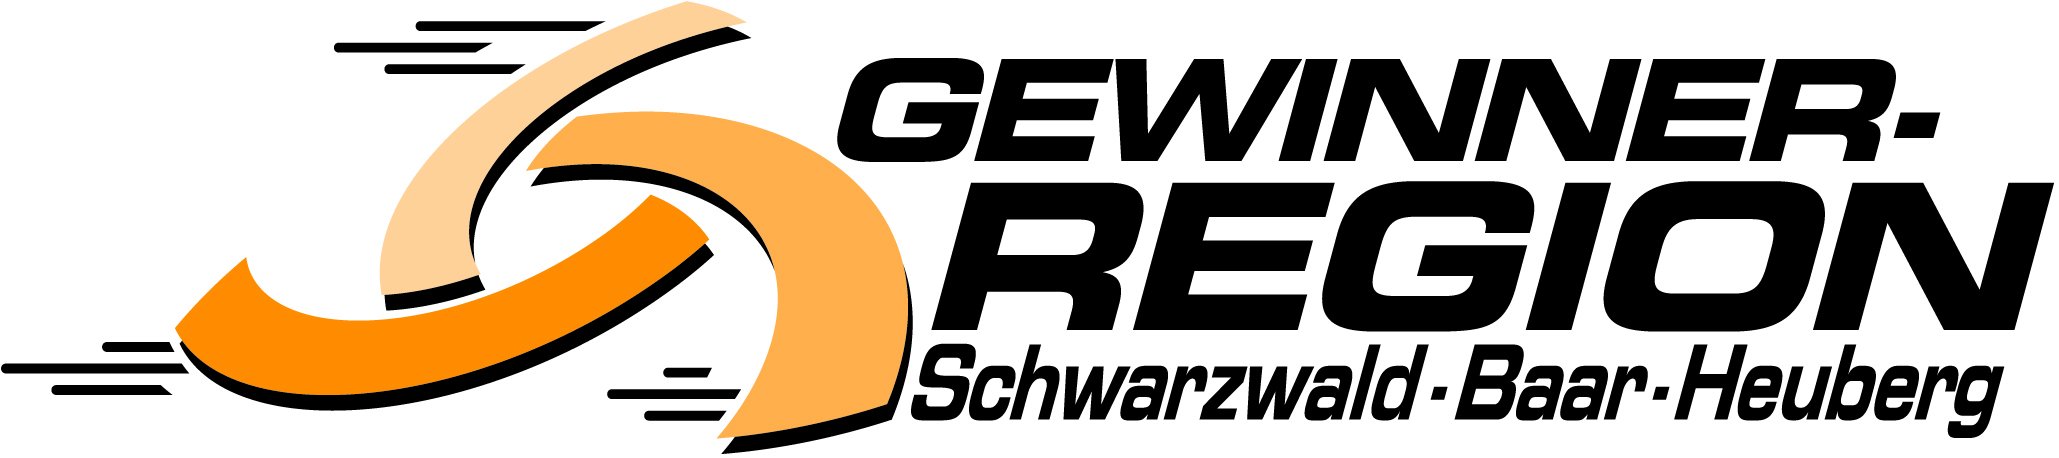 2007-07-15 logo_gewinnerregion